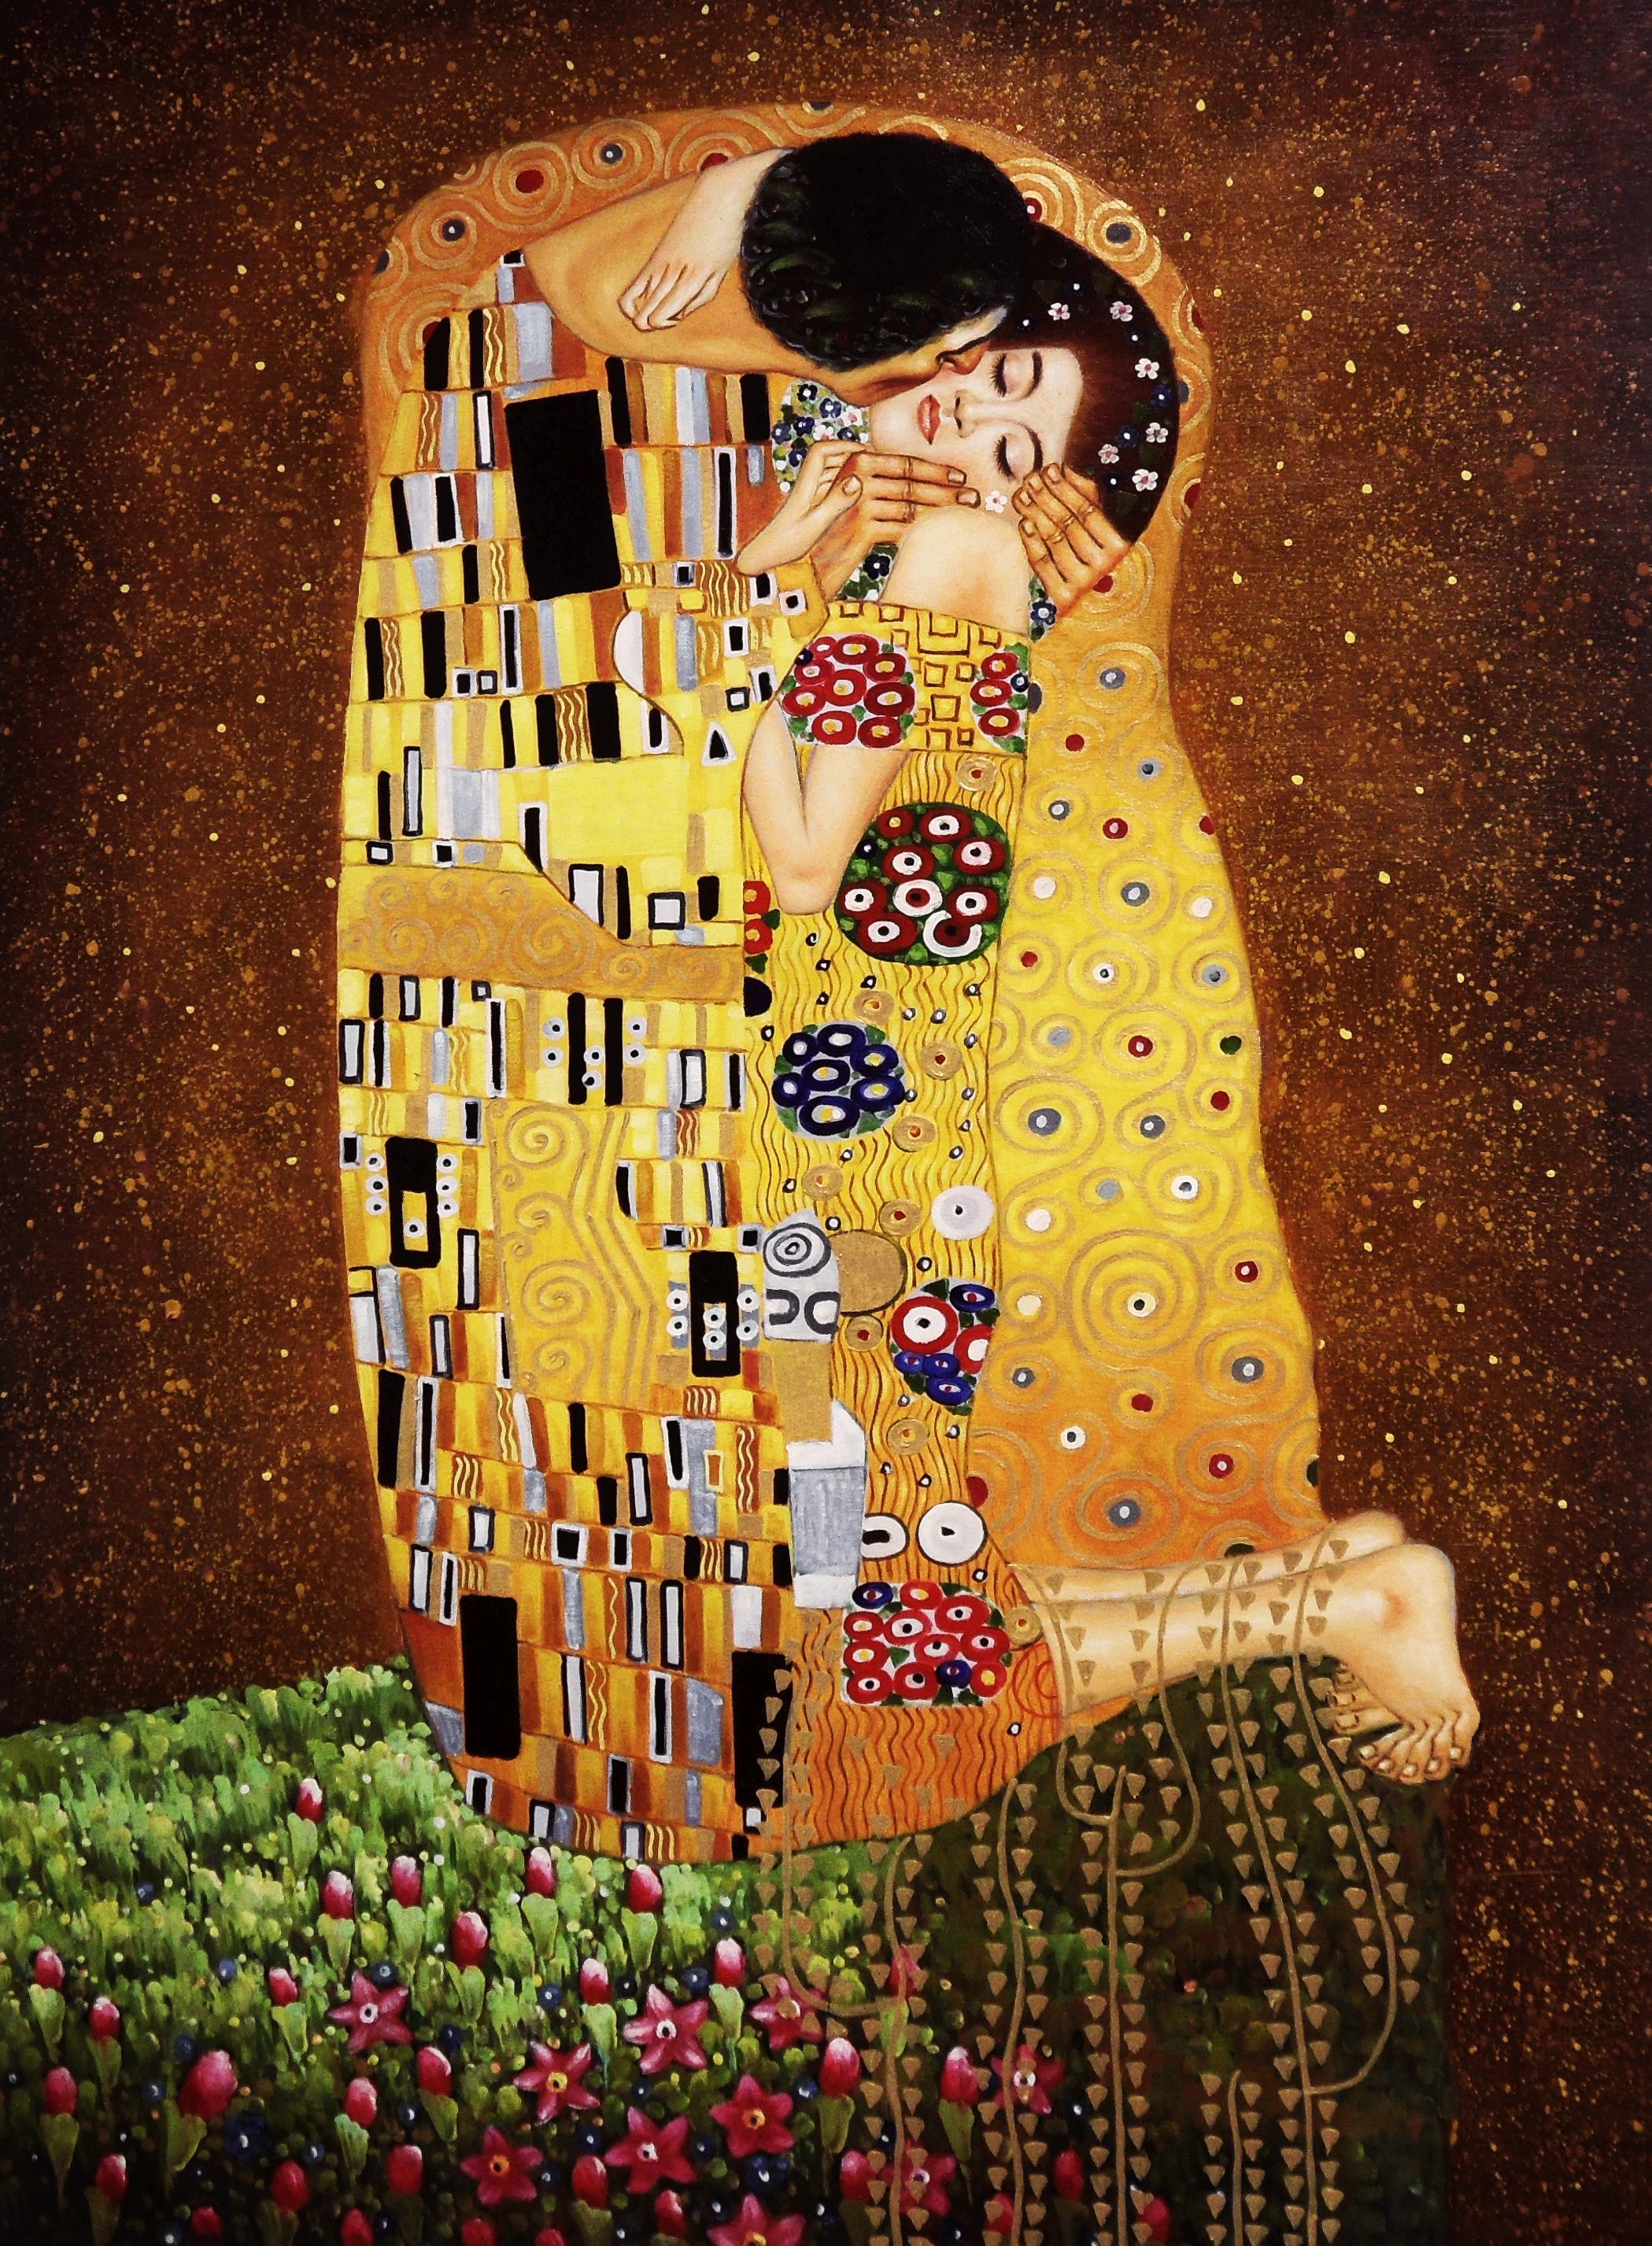 Gustav Klimt - Der Kuss k95375 90x120cm Jugendstil Ölgemälde handgemalt